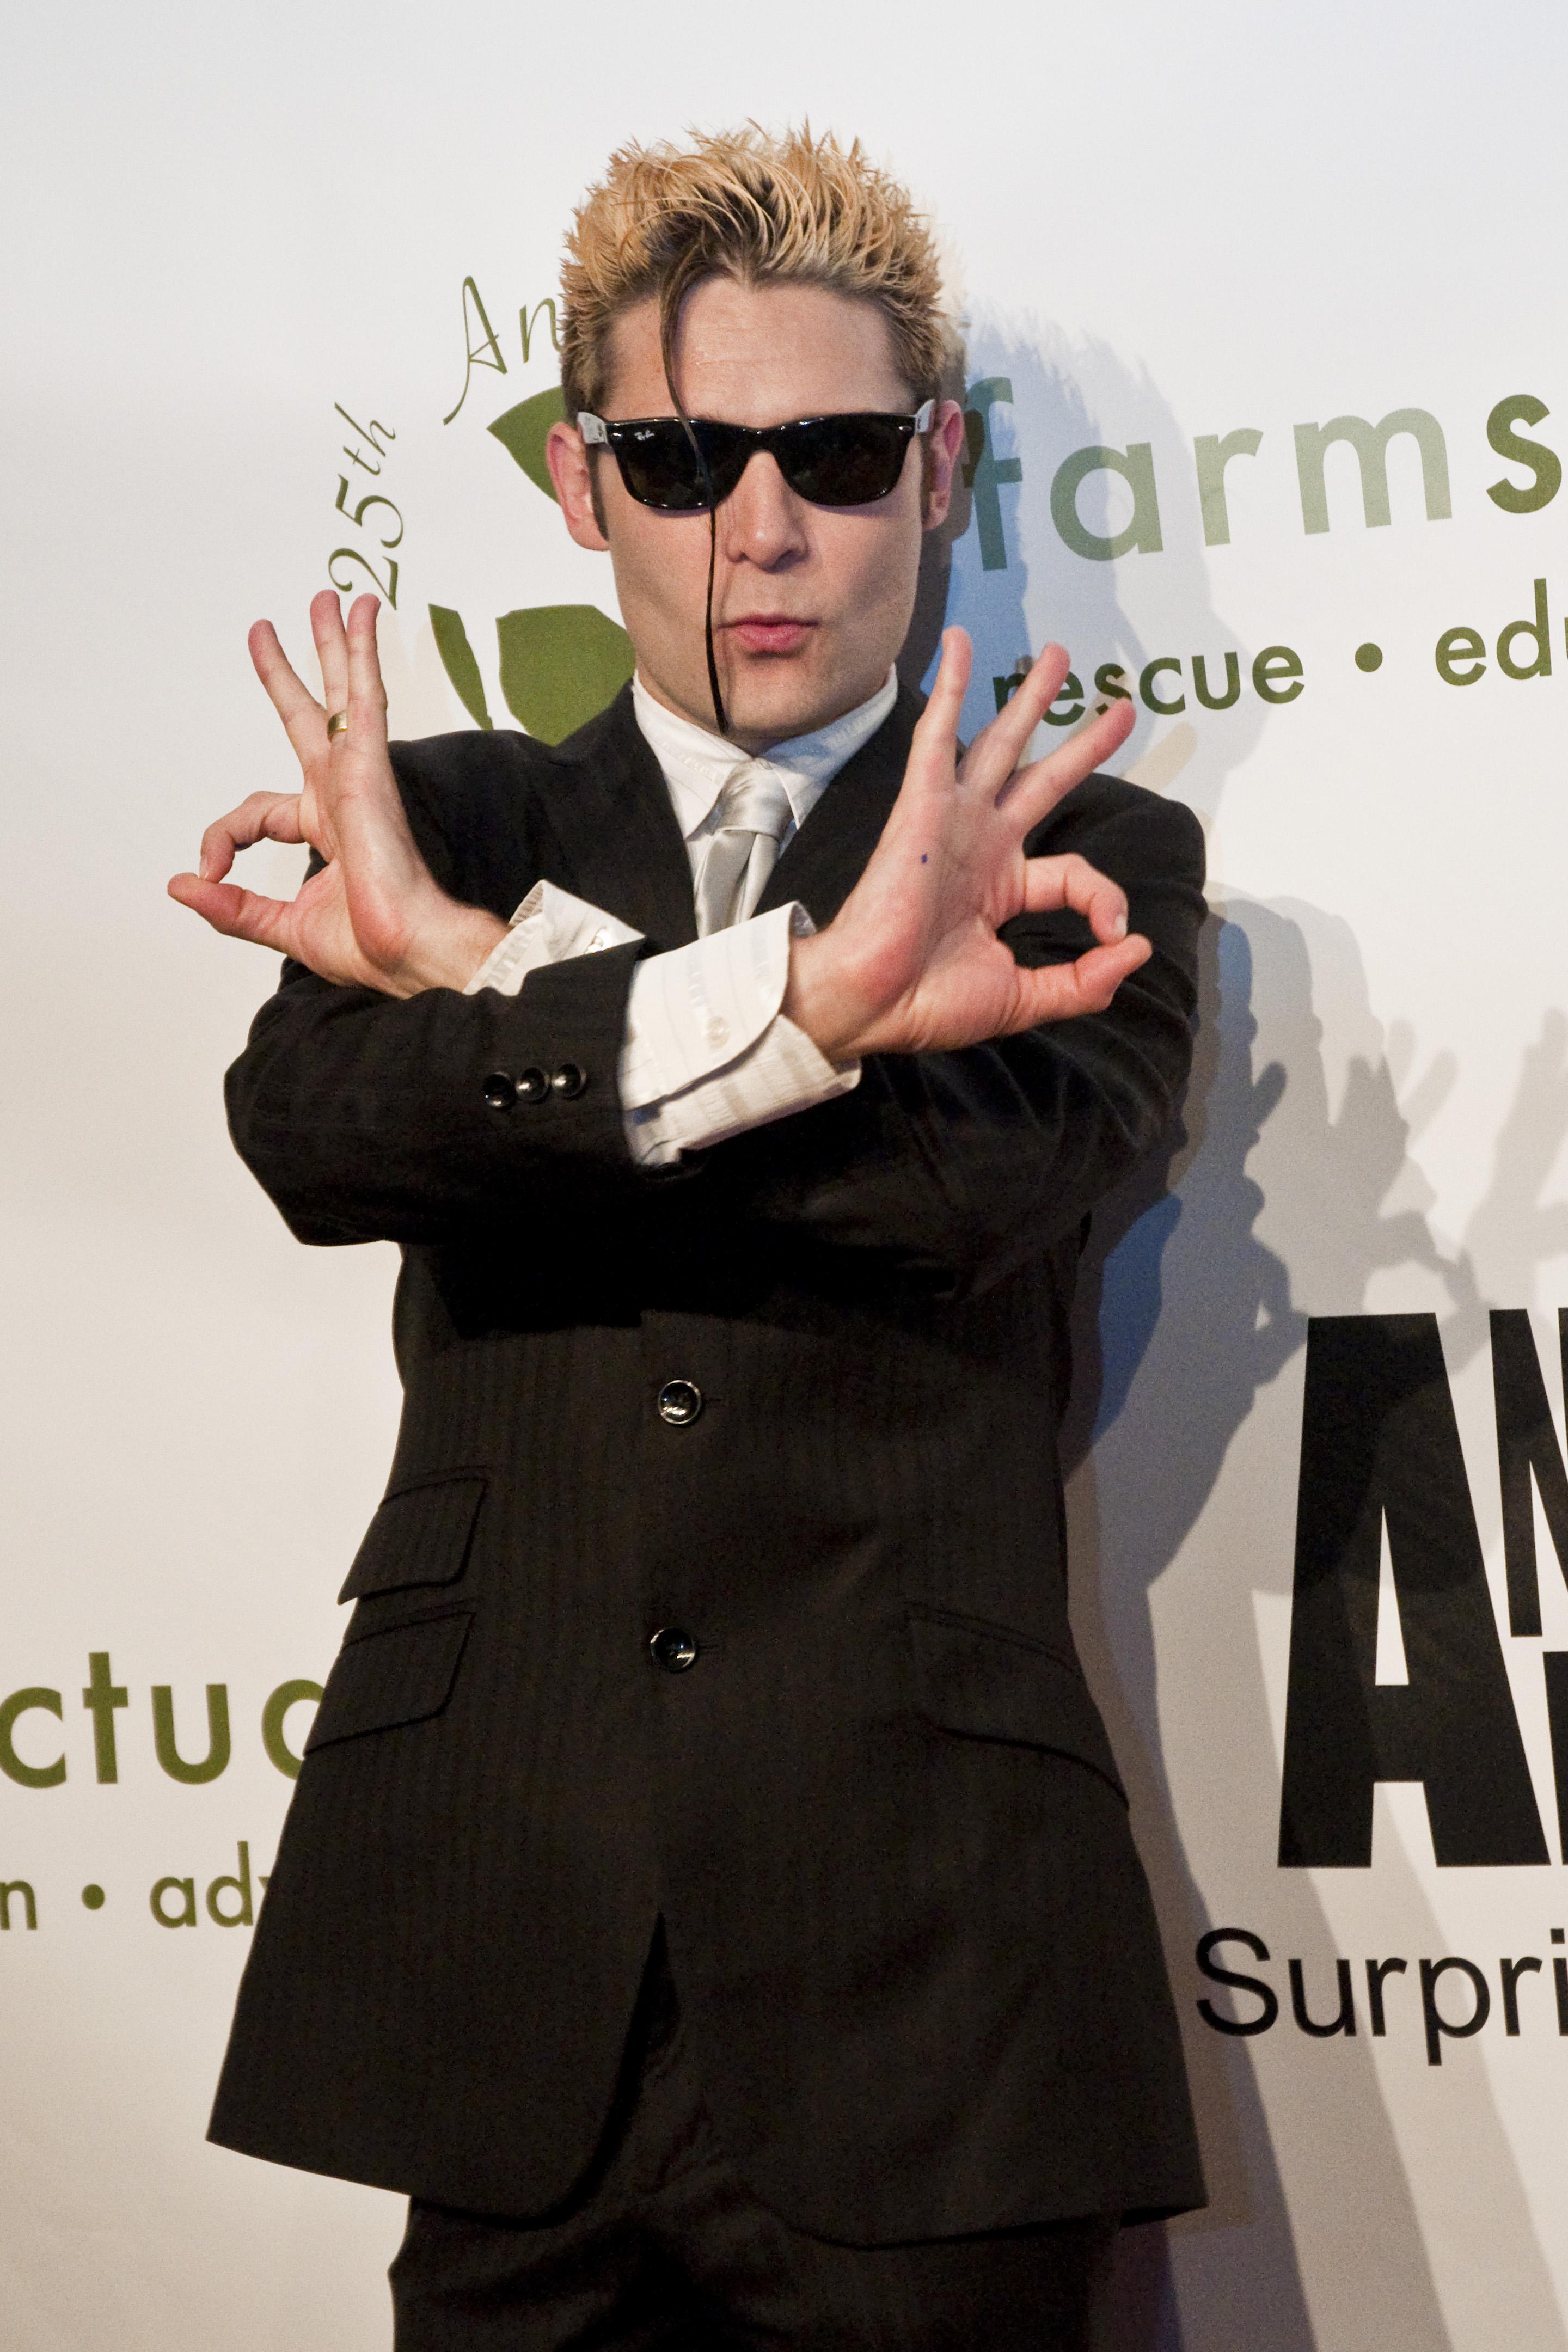 Corey Feldman